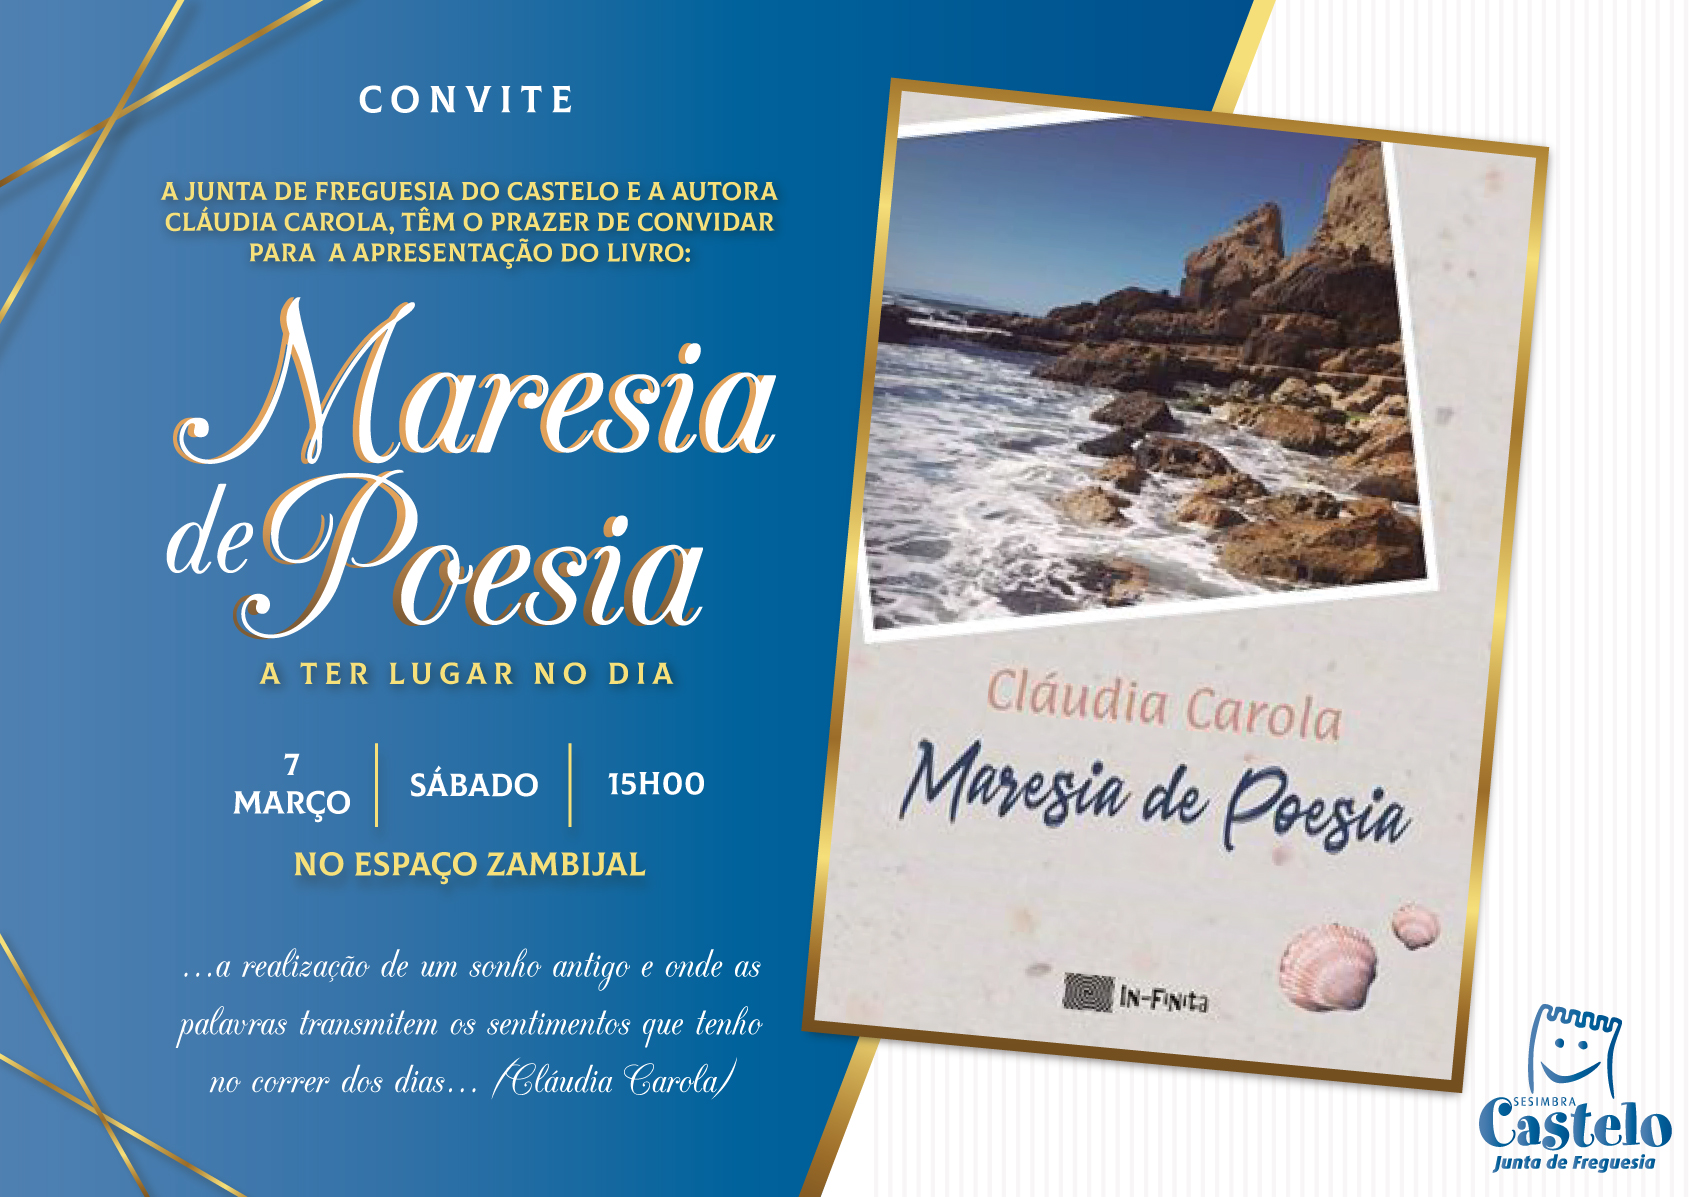 MARESIA DE POESIA de Cláudia Carola | APRESENTAÇÂO